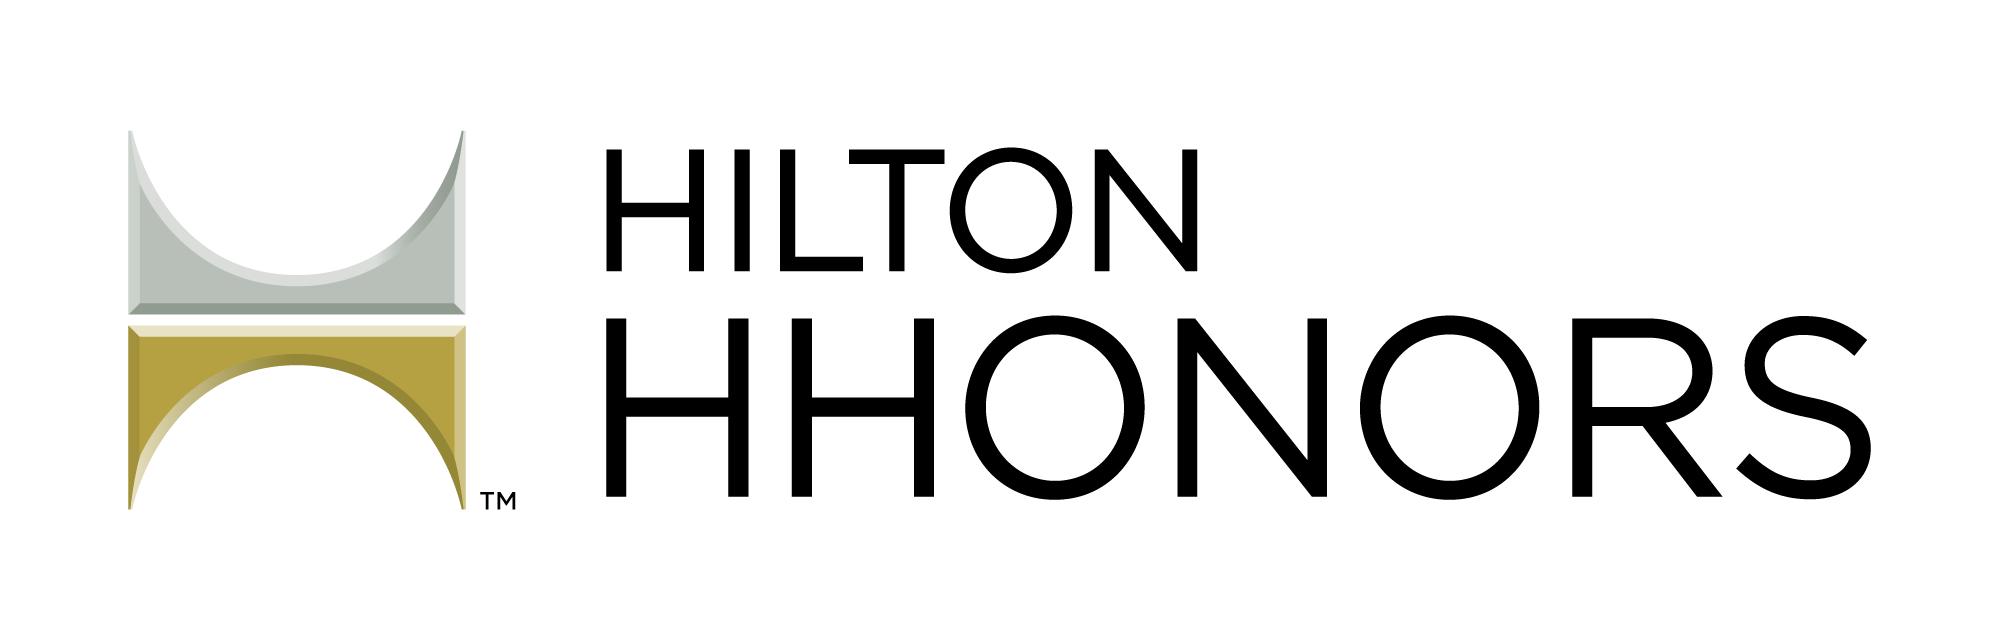 Hilton HHonors Loyalty Program